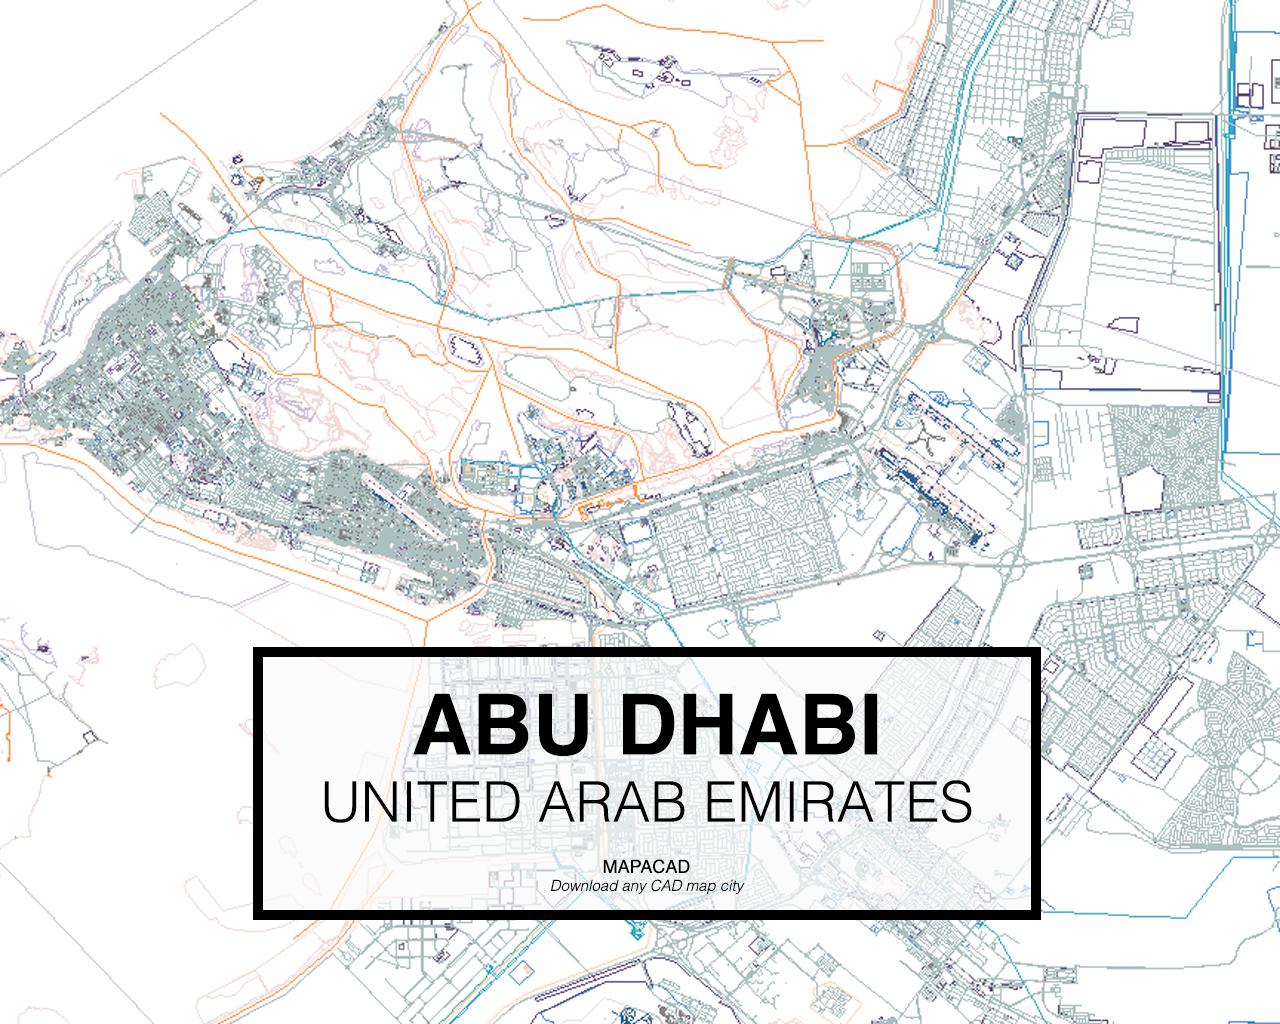 abu dhabi arab emirates 01 mapacad download map cad dwg dxf autocad free 2d 3d. Black Bedroom Furniture Sets. Home Design Ideas